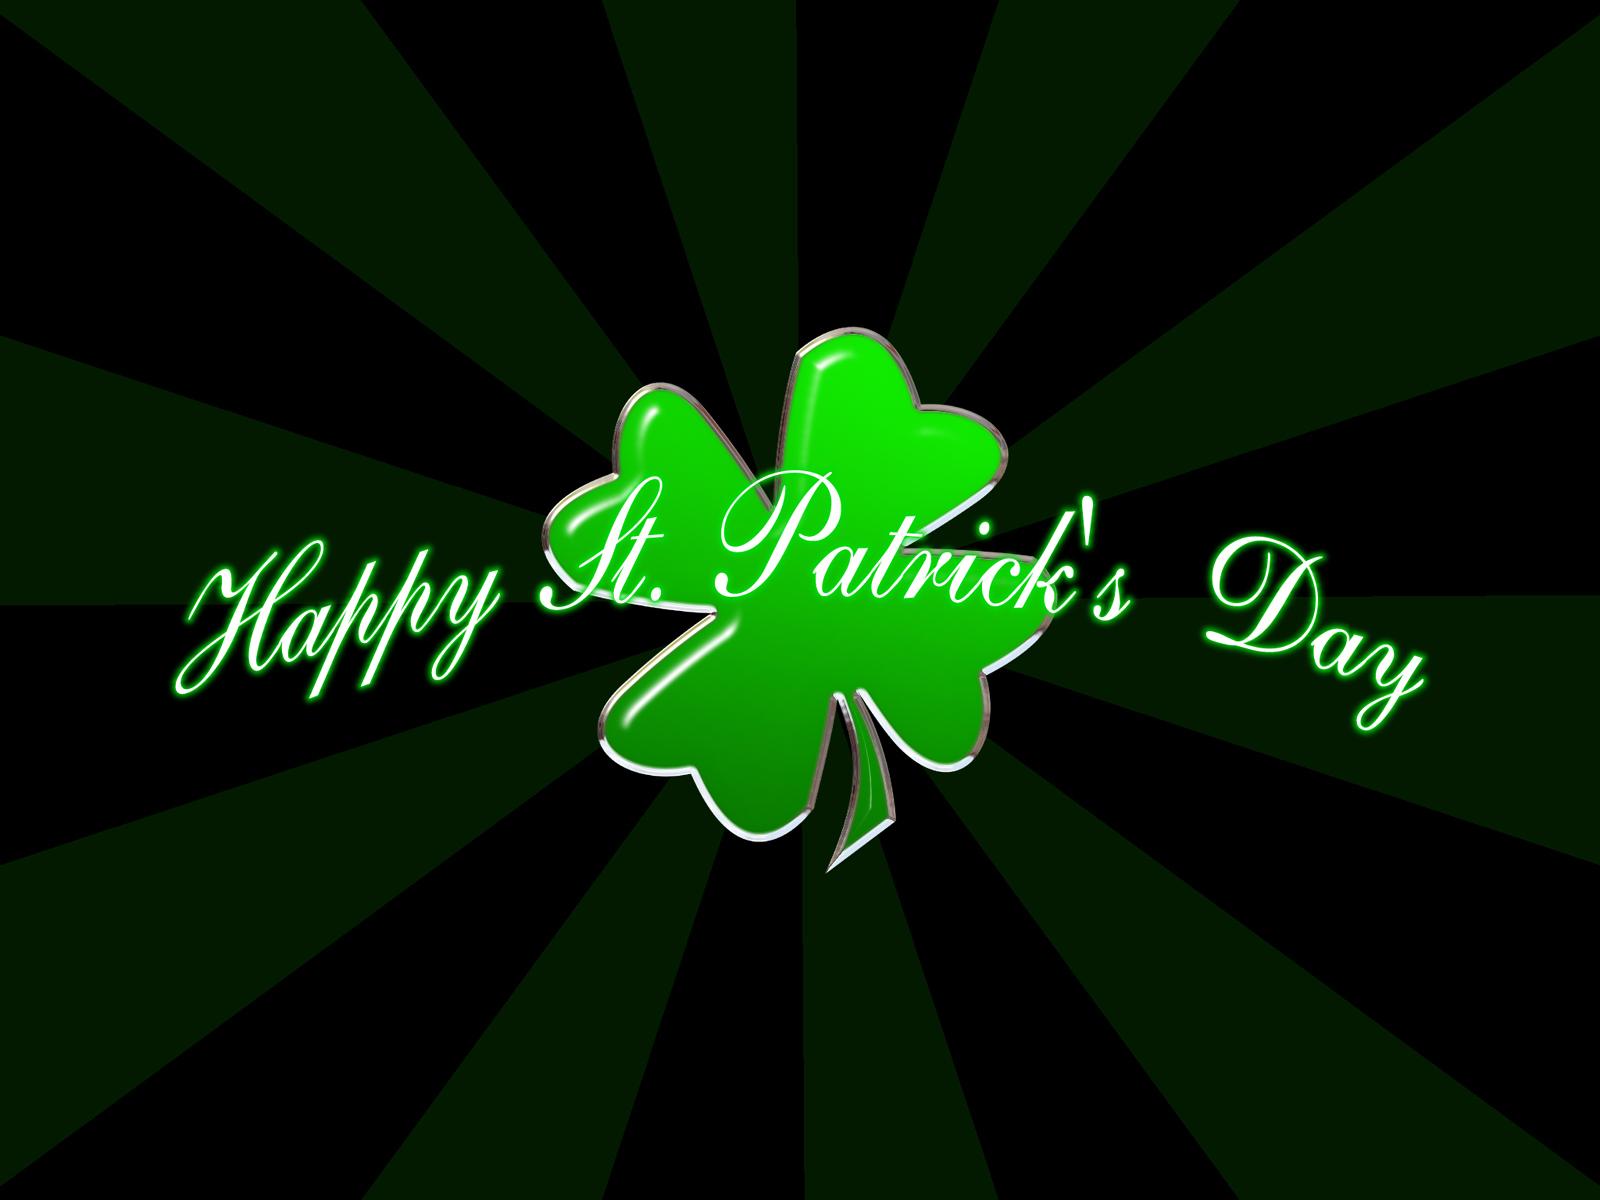 Happy St. Patrick's Day 2014, wallpaper, Happy St. Patrick's Day 2014 ...